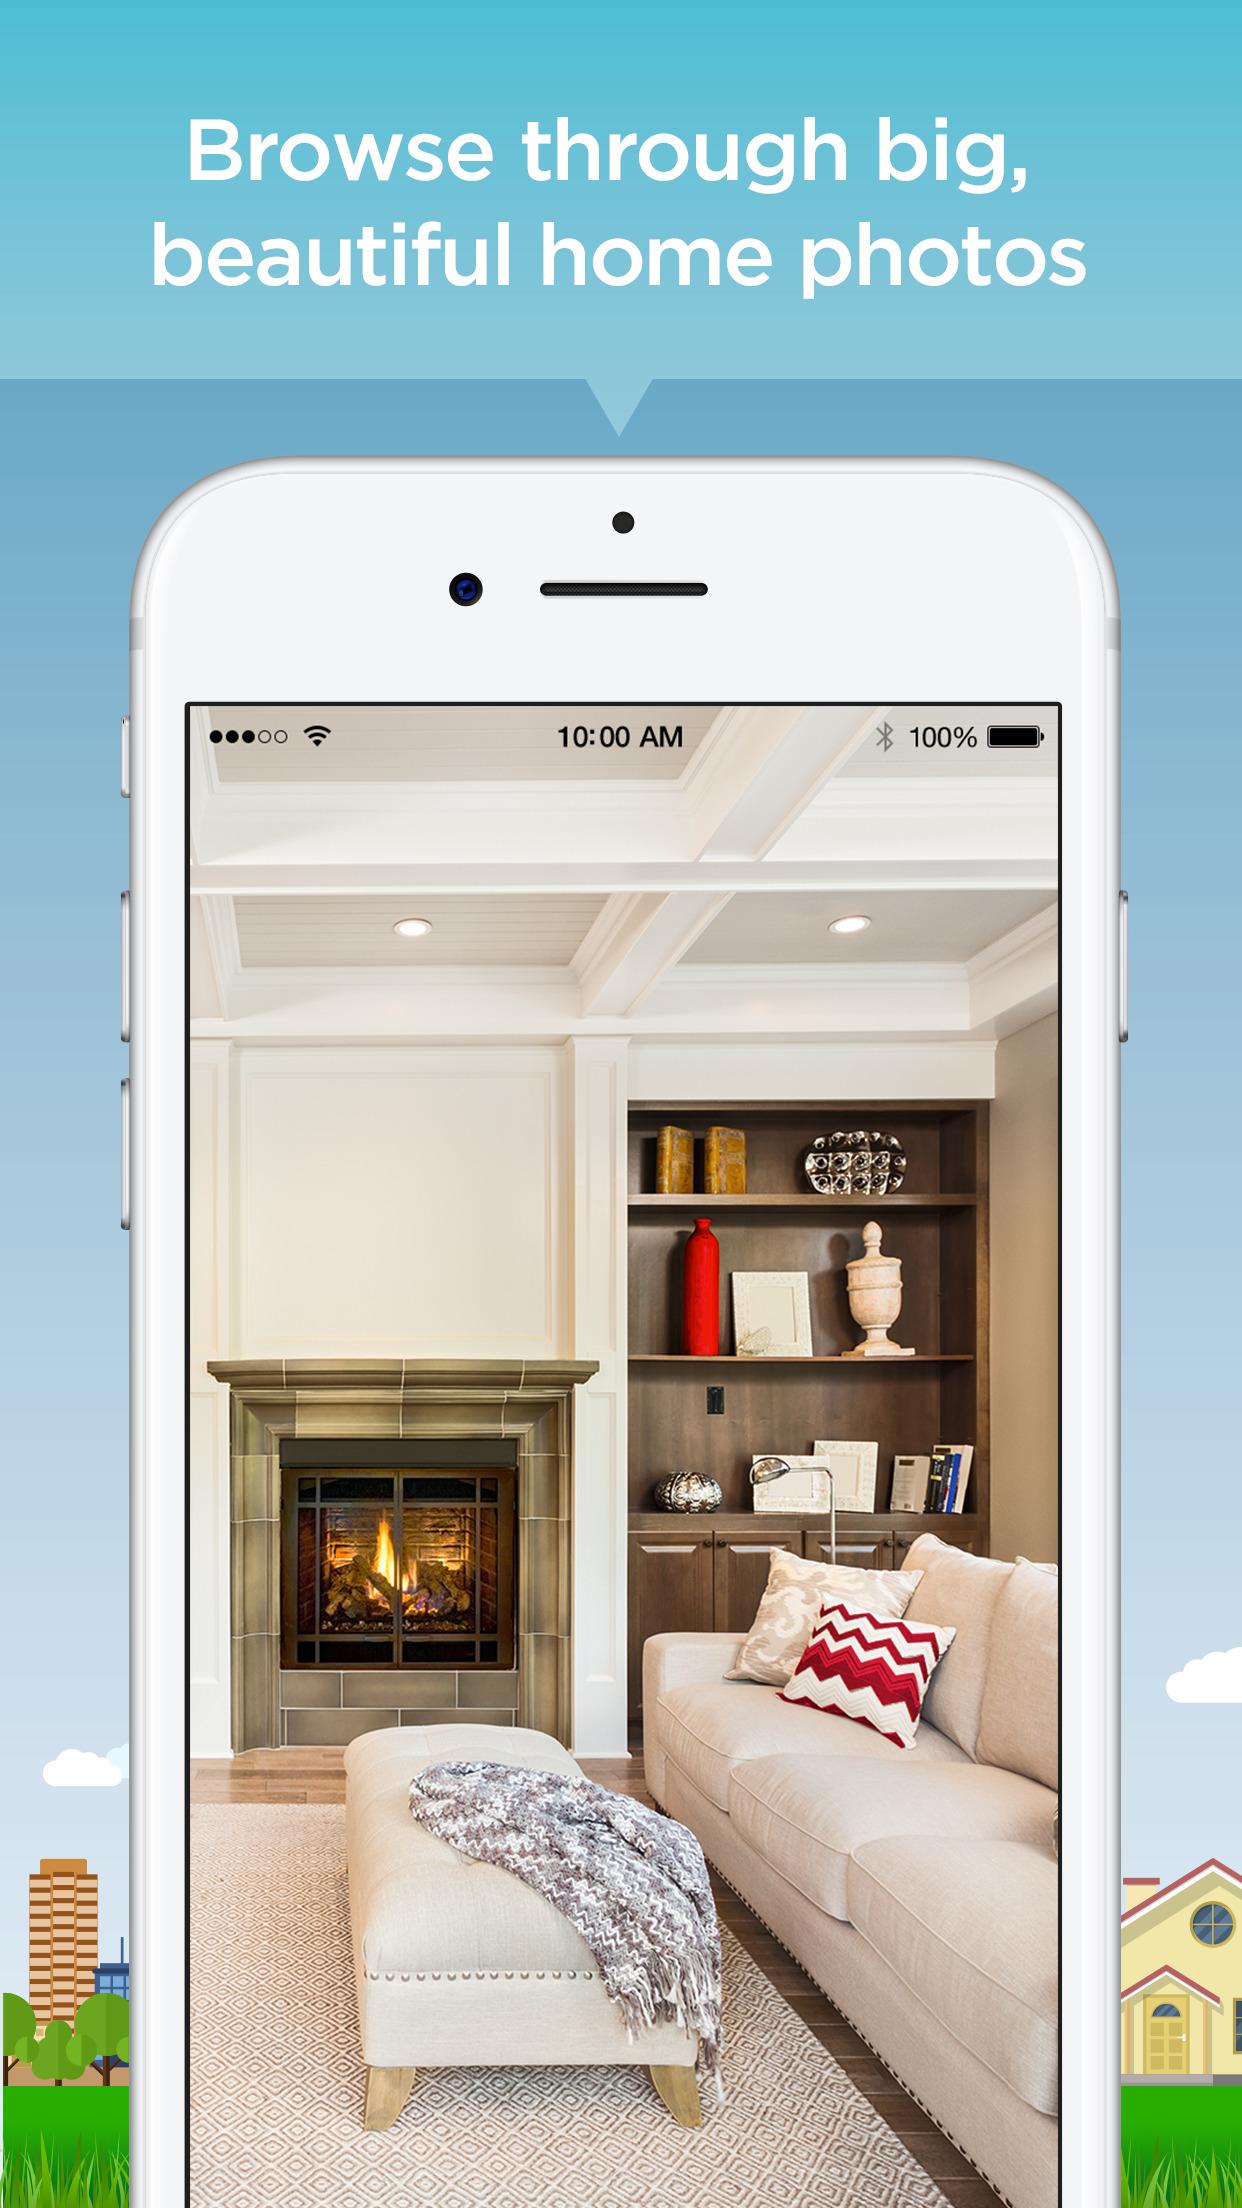 Realtor.com Real Estate - Homes for Sale and Rent Screenshot